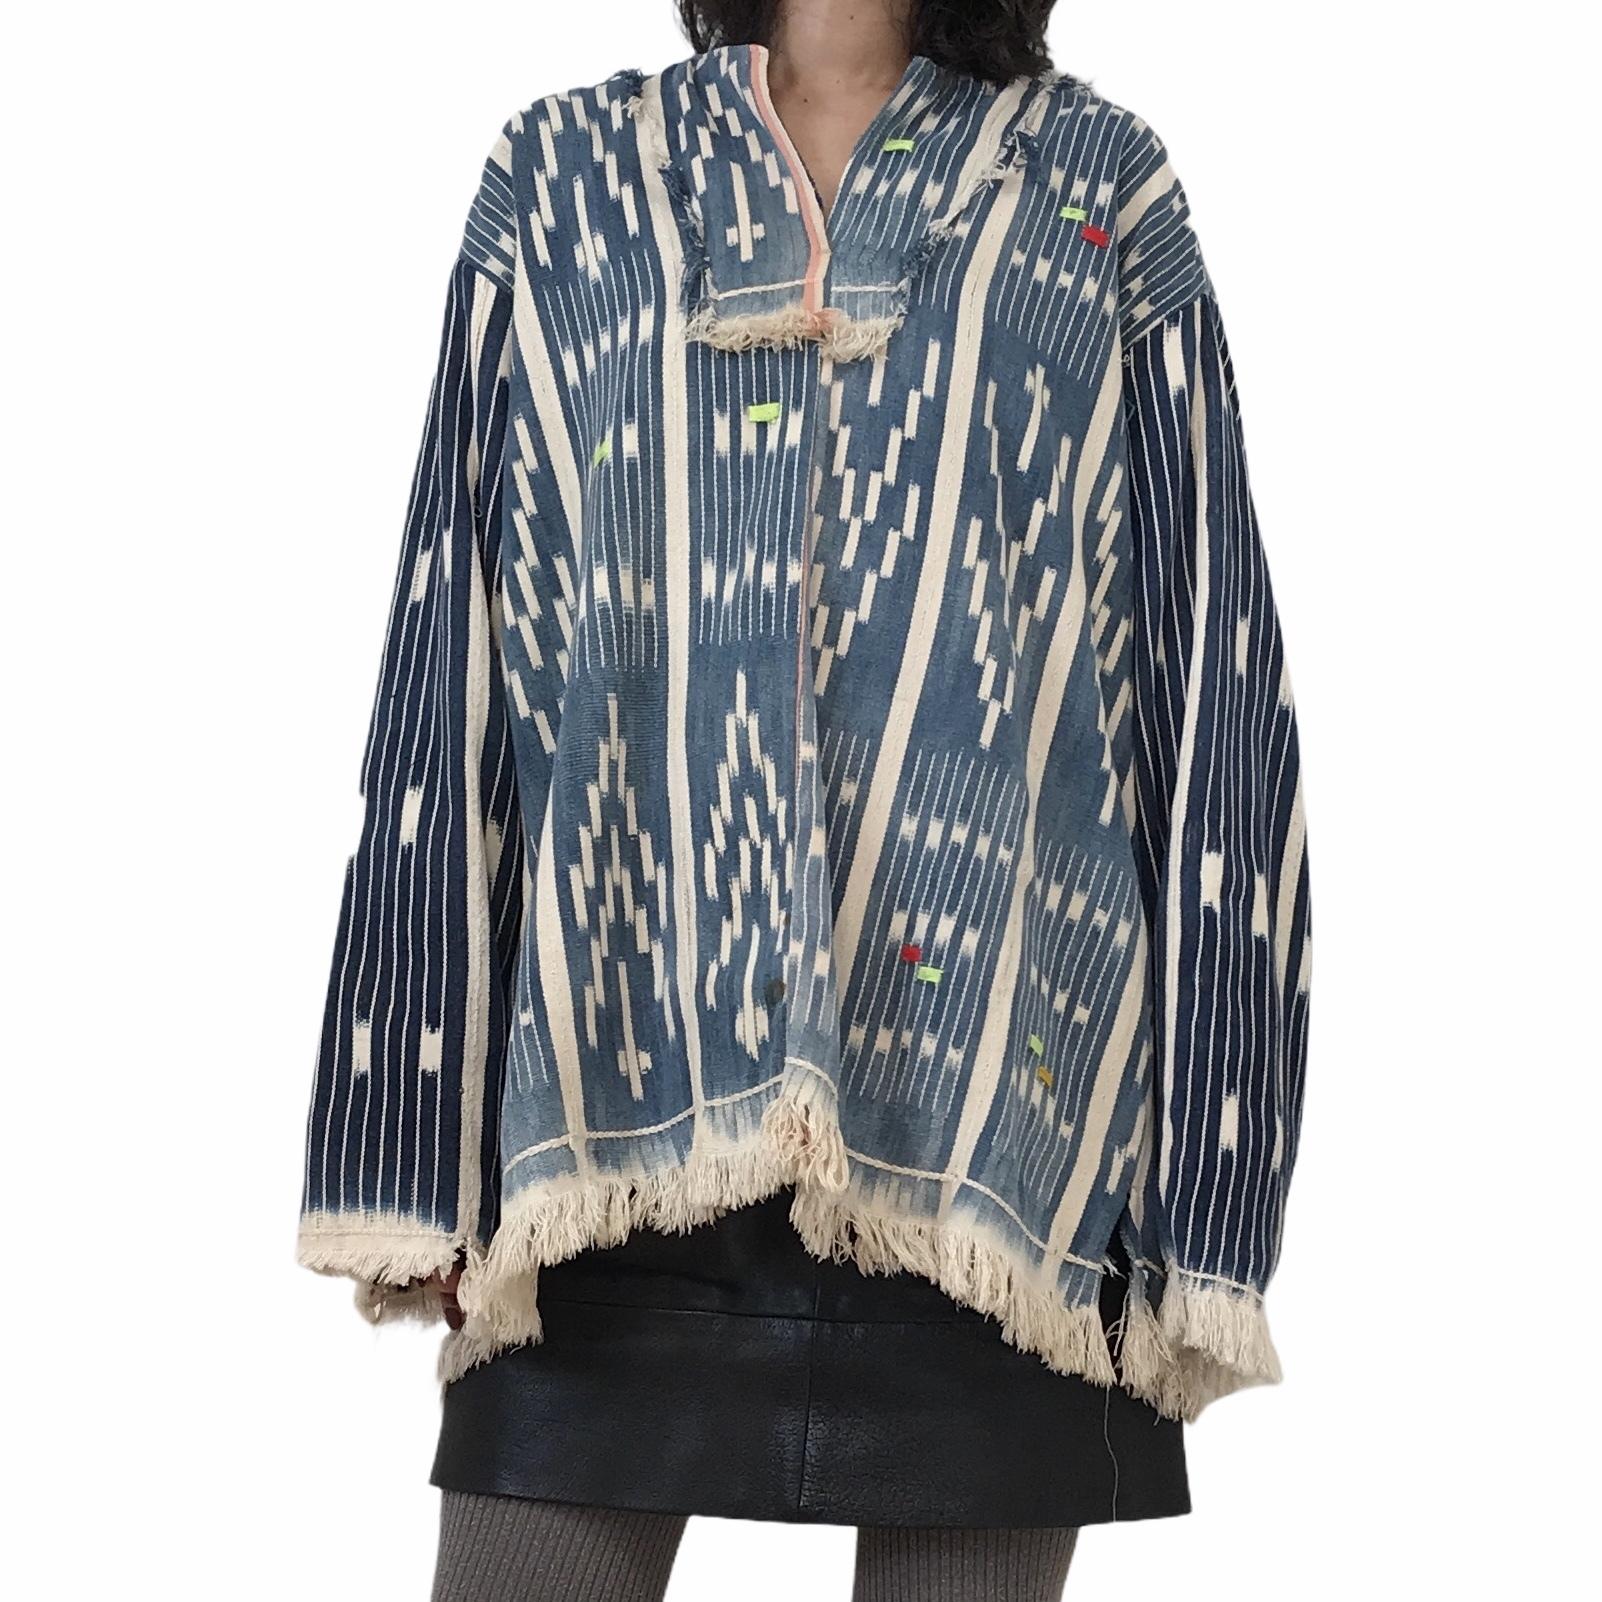 LIOT Vintage Indigo African Fabric Tunic